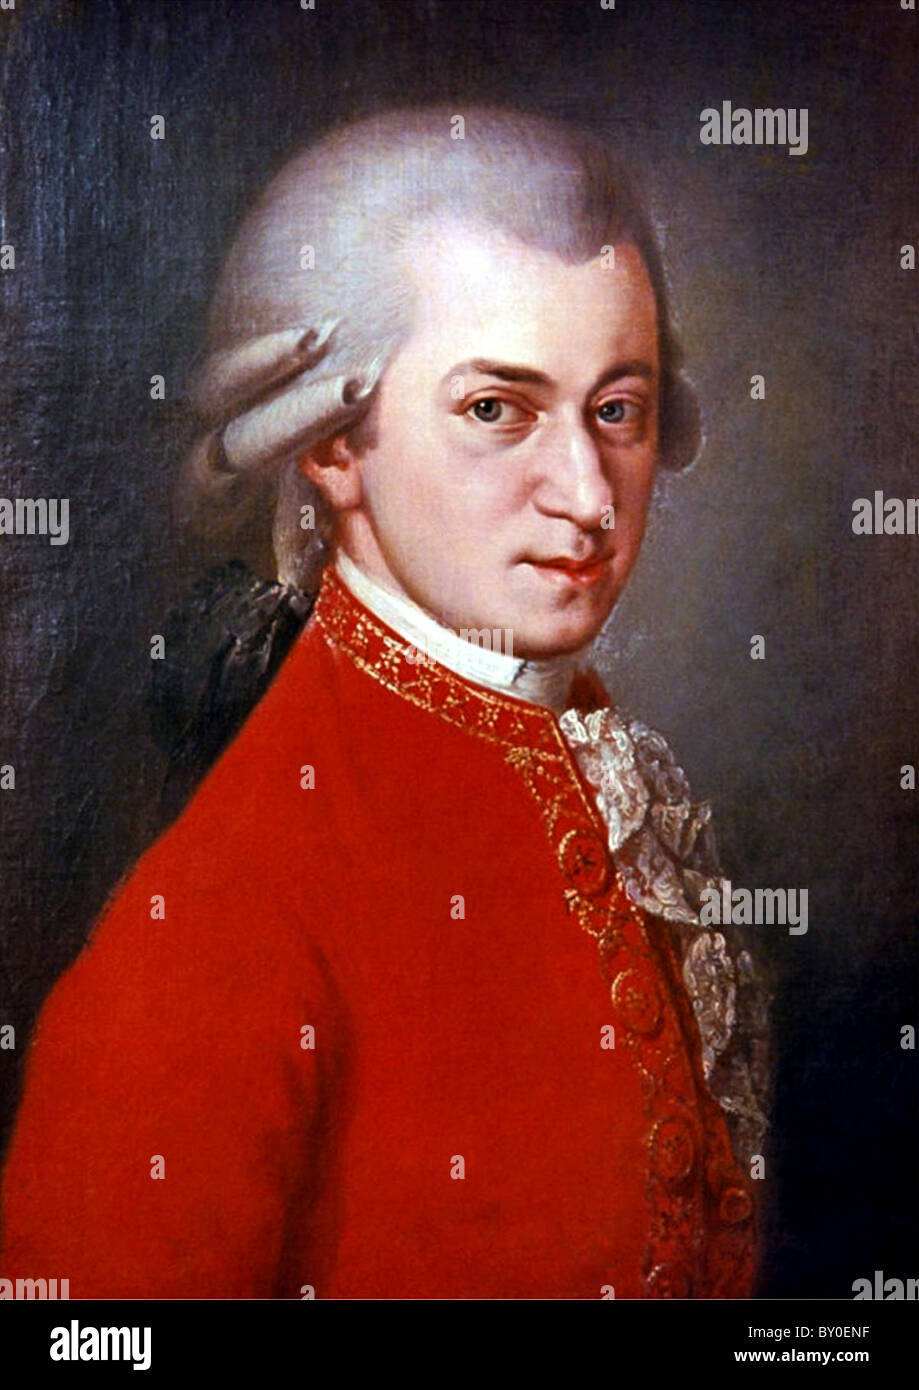 Mozart, Komponist Wolfgang Amadeus Mozart Stockfoto